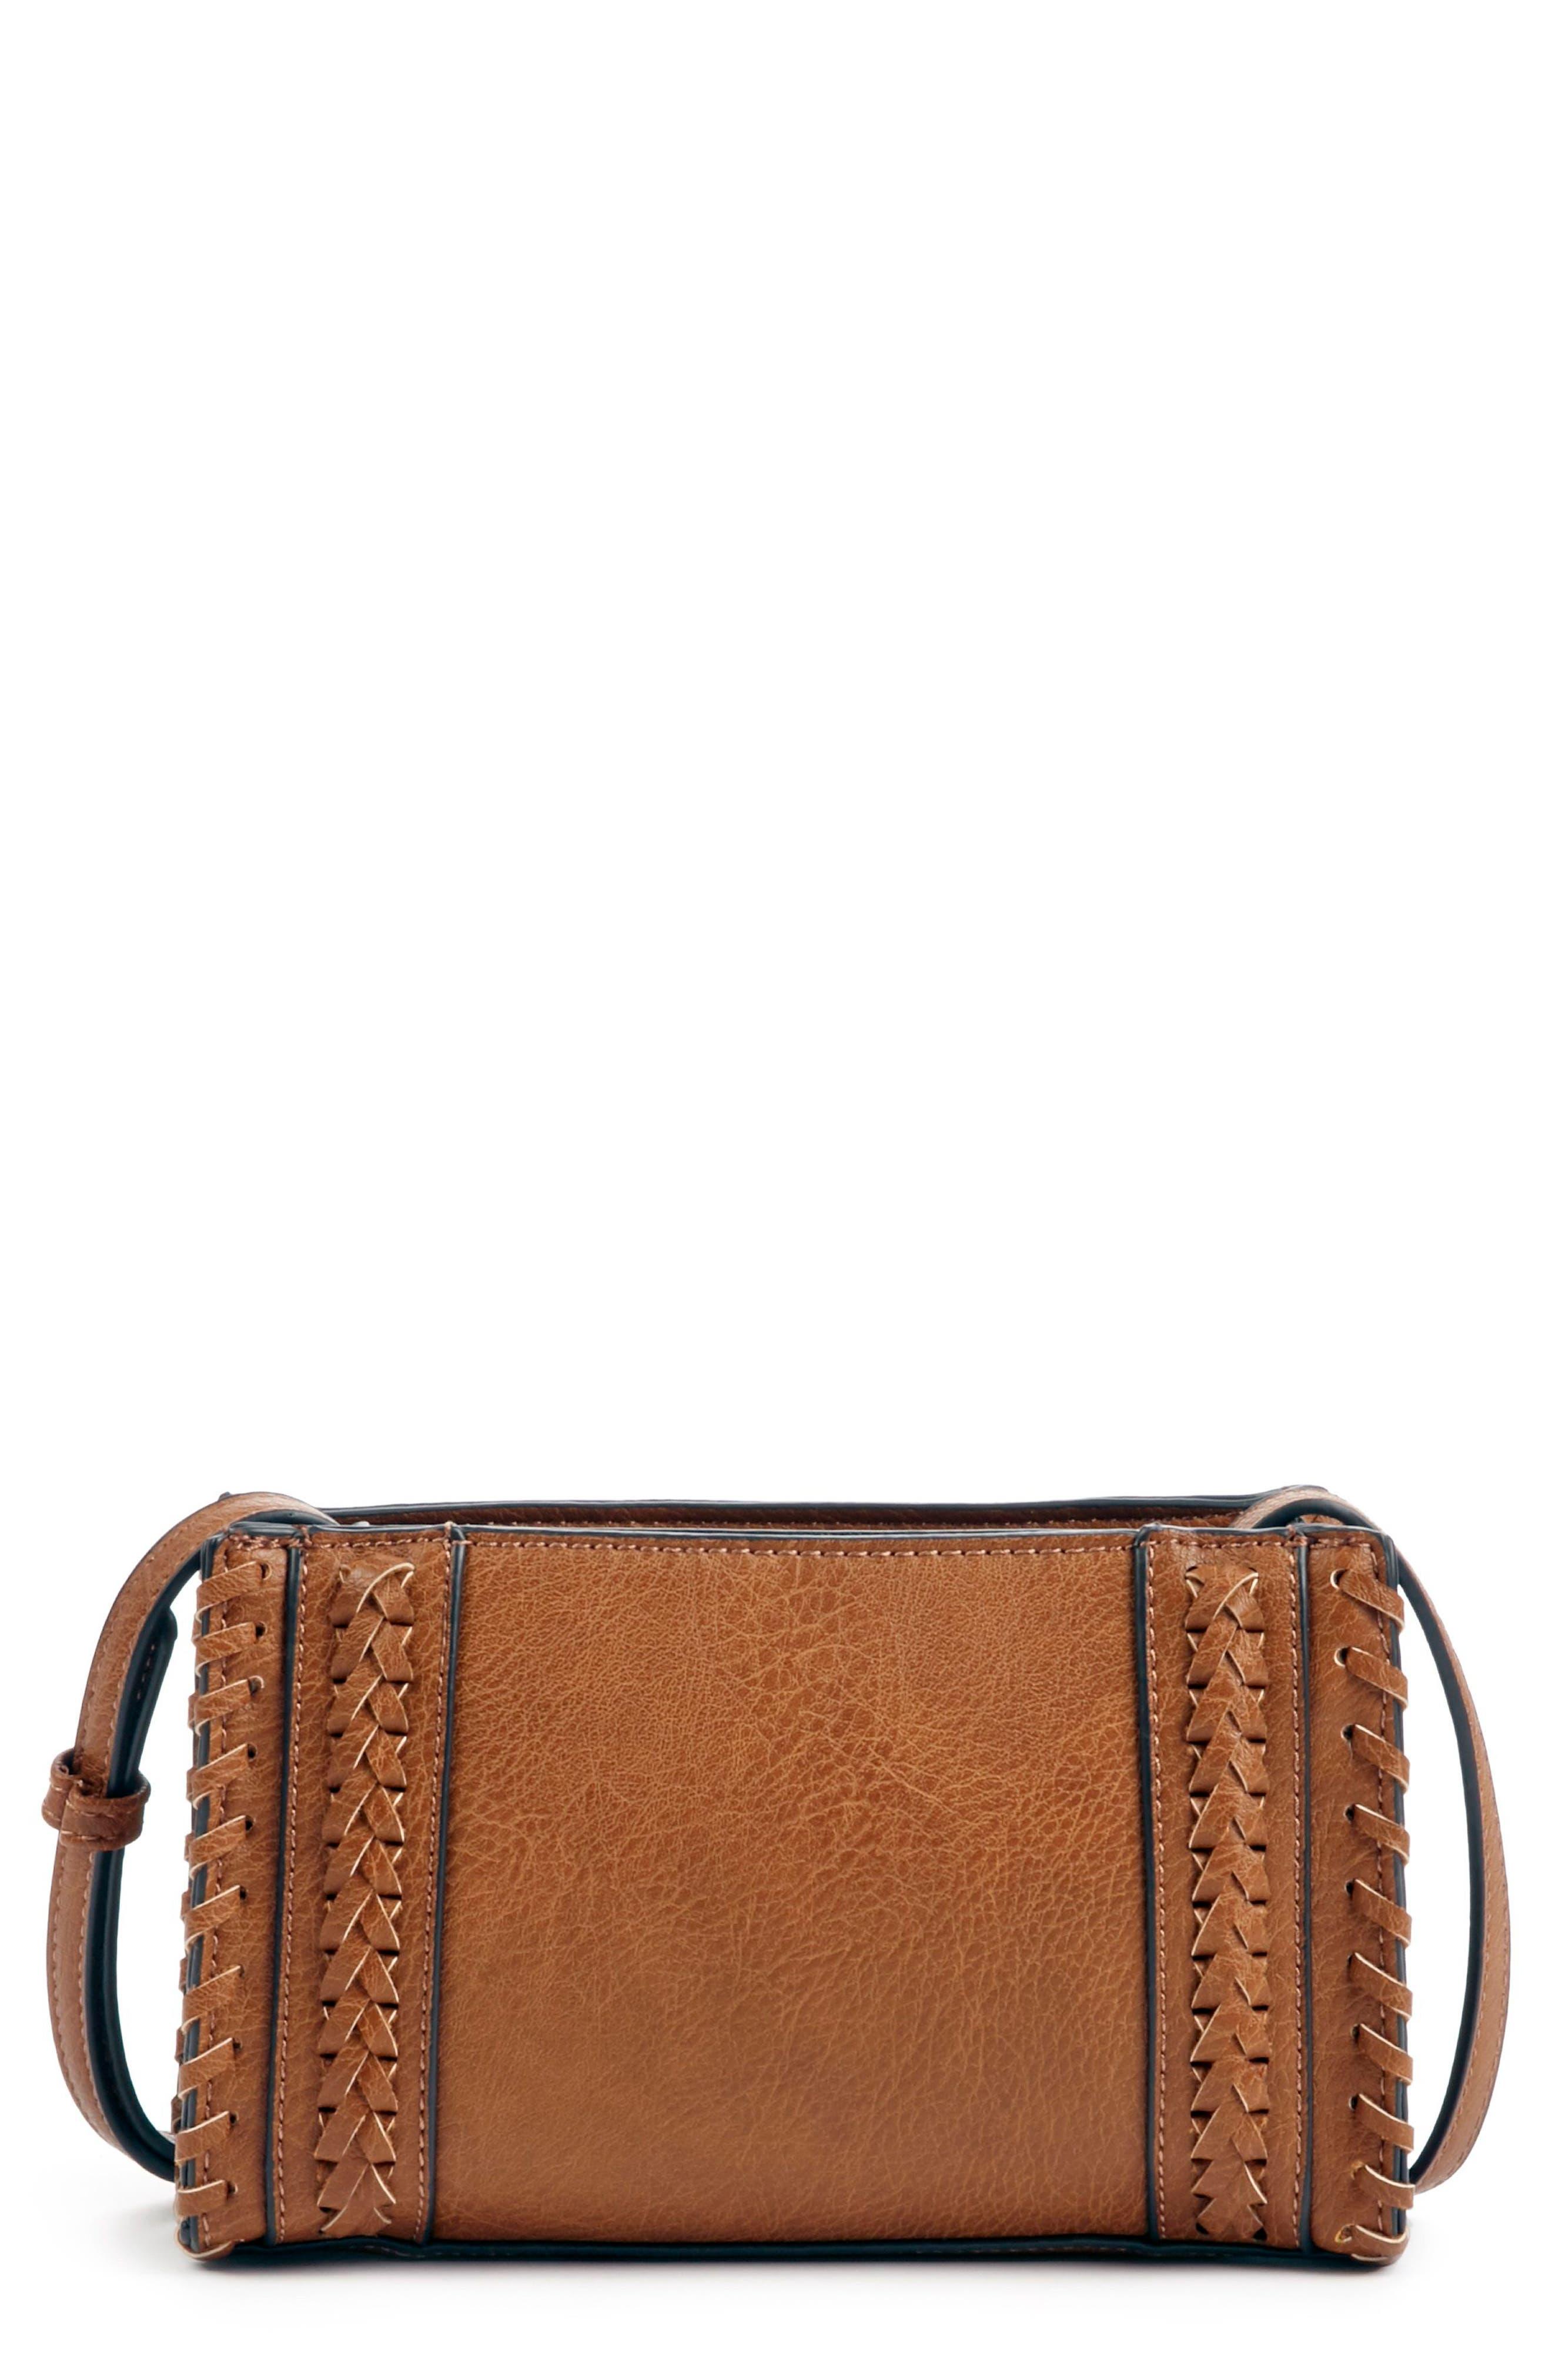 SOLE SOCIETY Destin Faux Leather Crossbody Bag, Main, color, 230